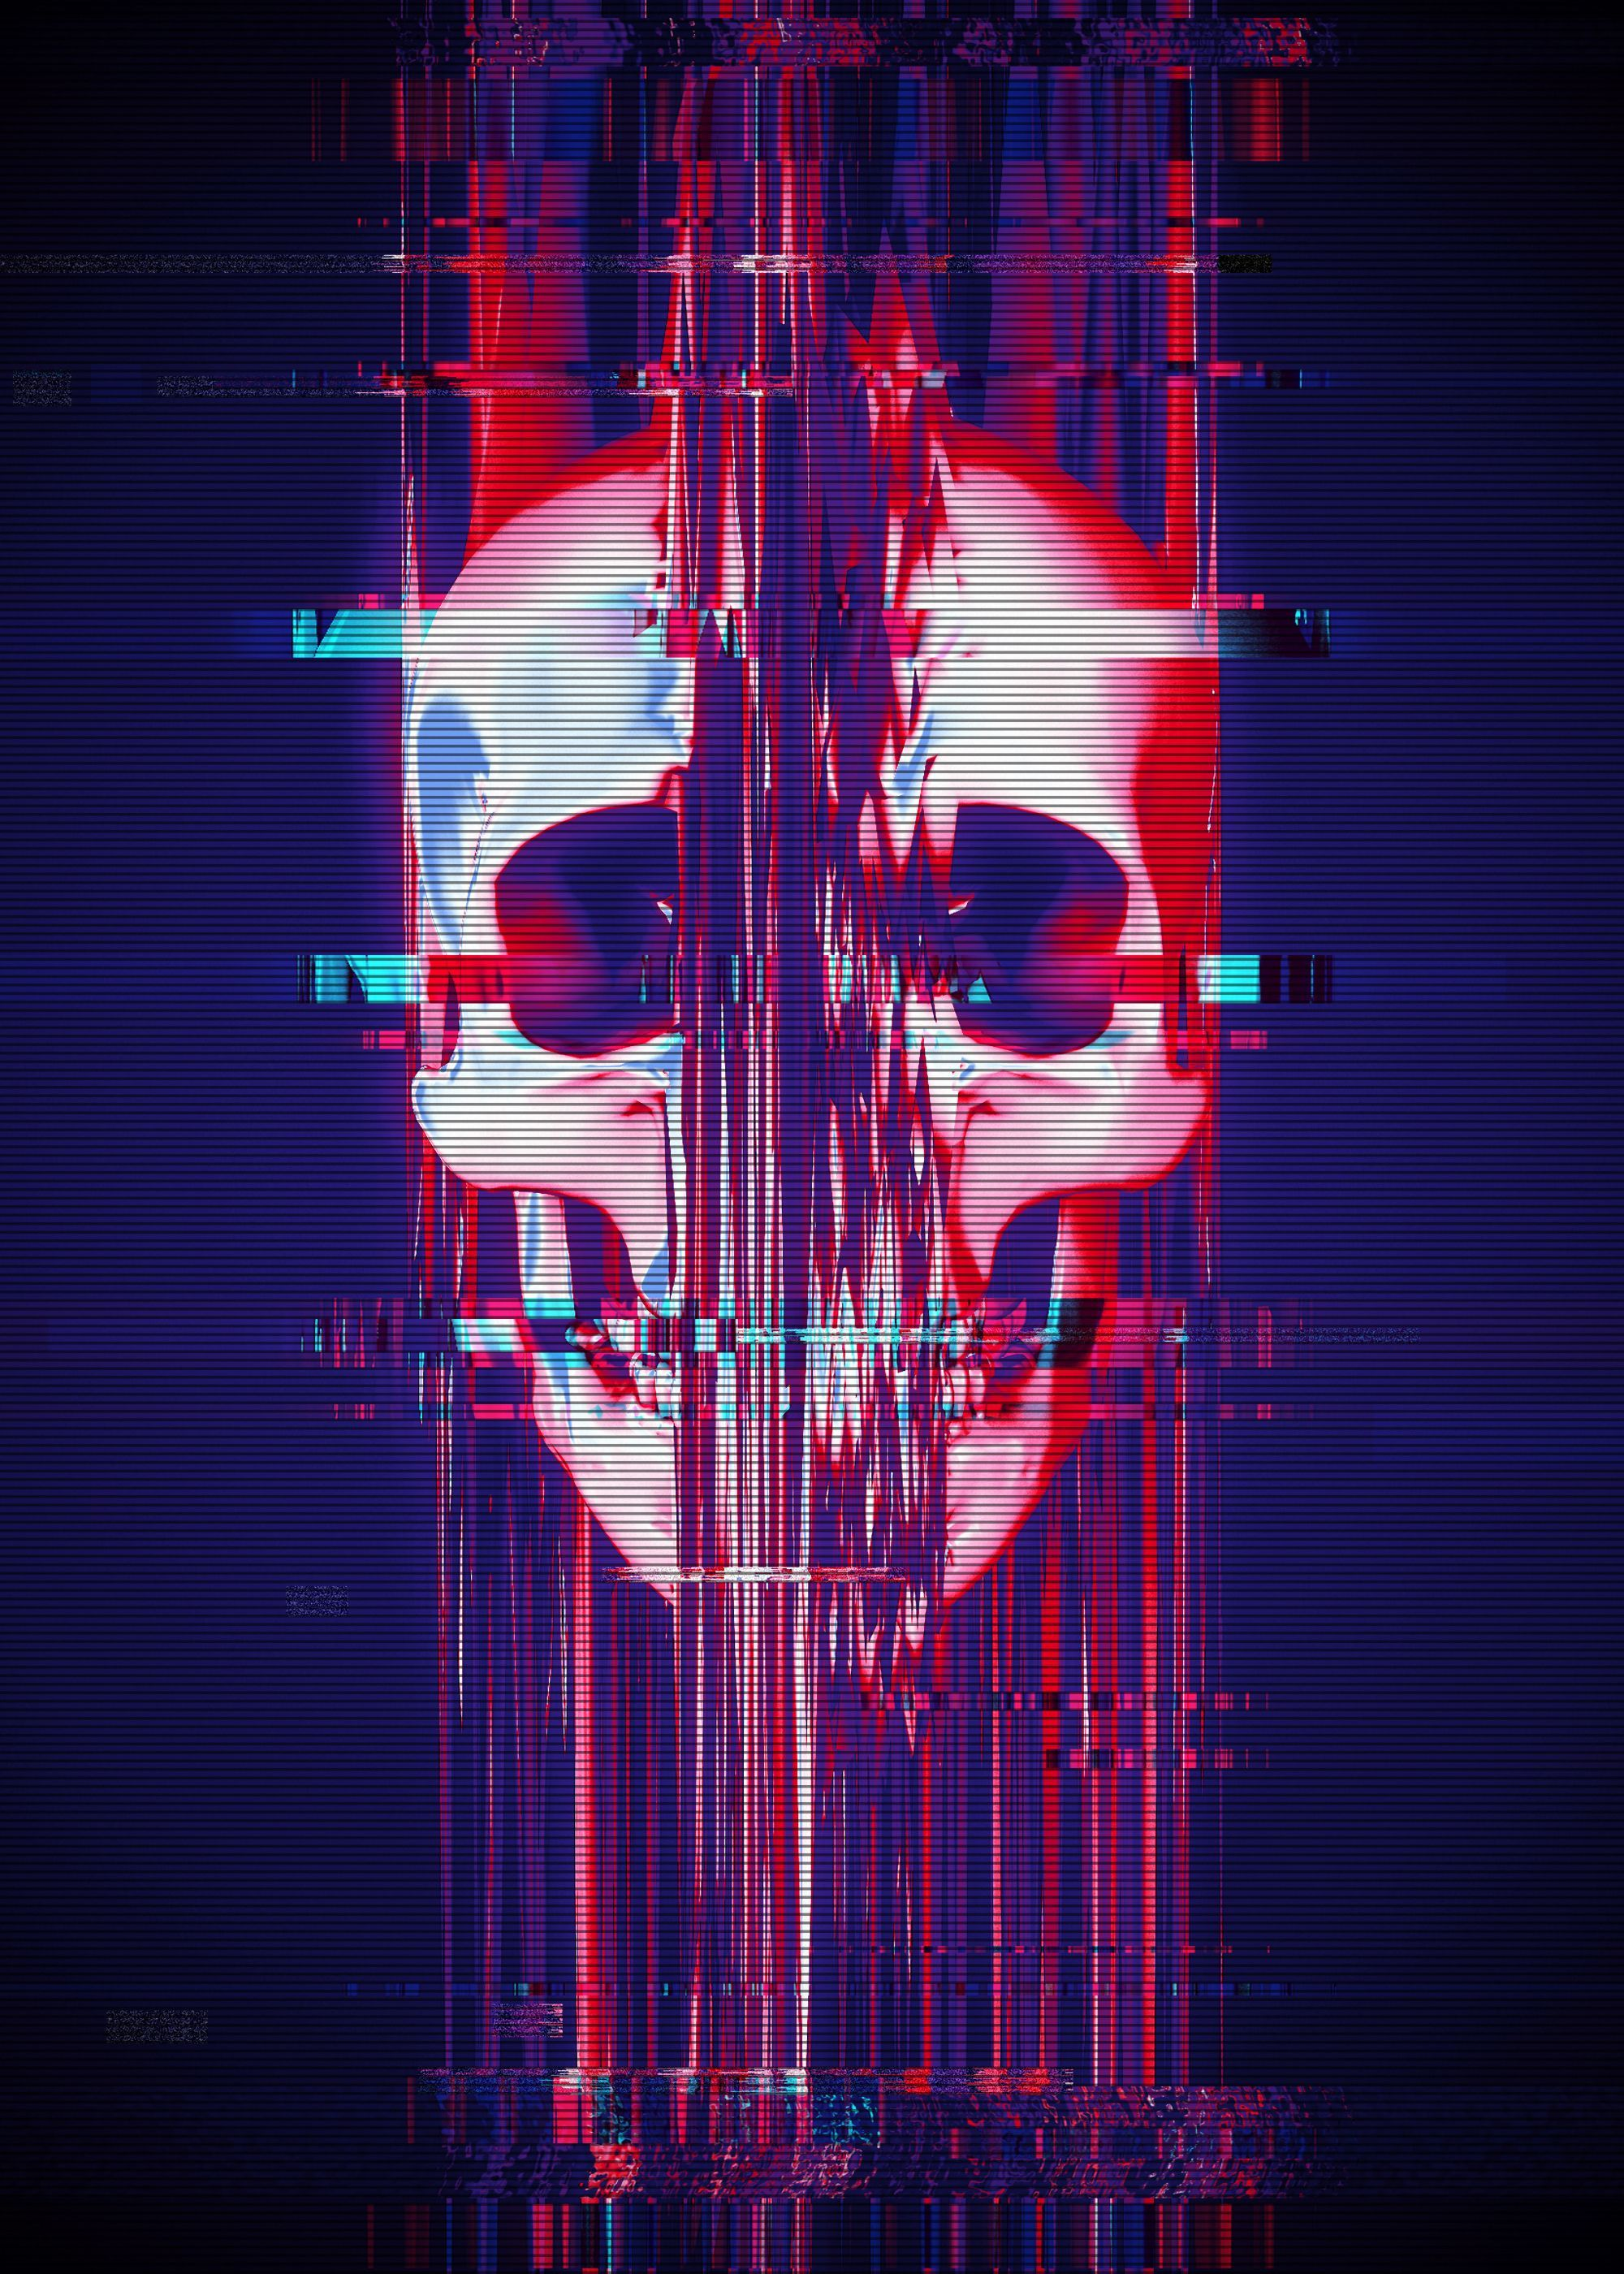 Glitch Skull Wallpapers   Top Glitch Skull Backgrounds 2000x2800